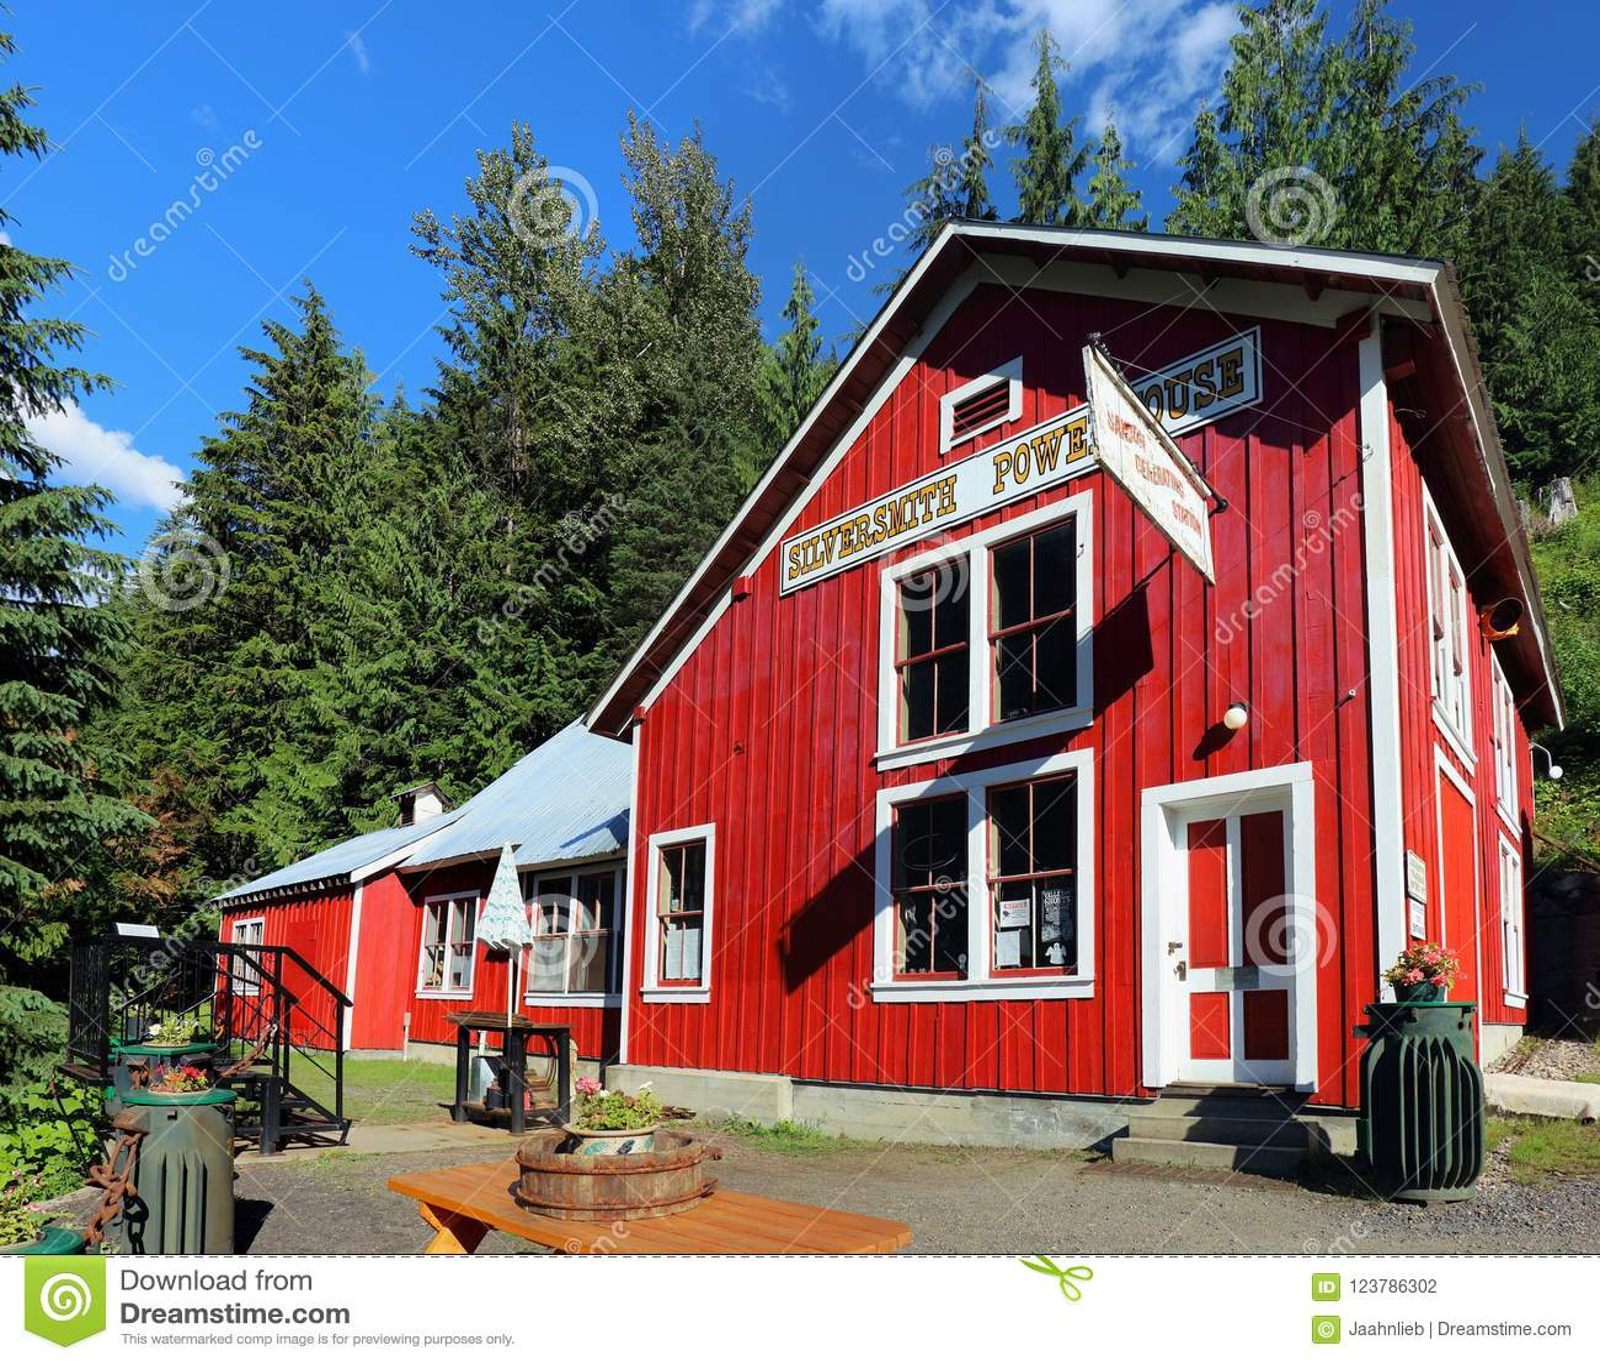 Historischer Silberschmied Powerhouse in Sandon, Britisch-Columbia